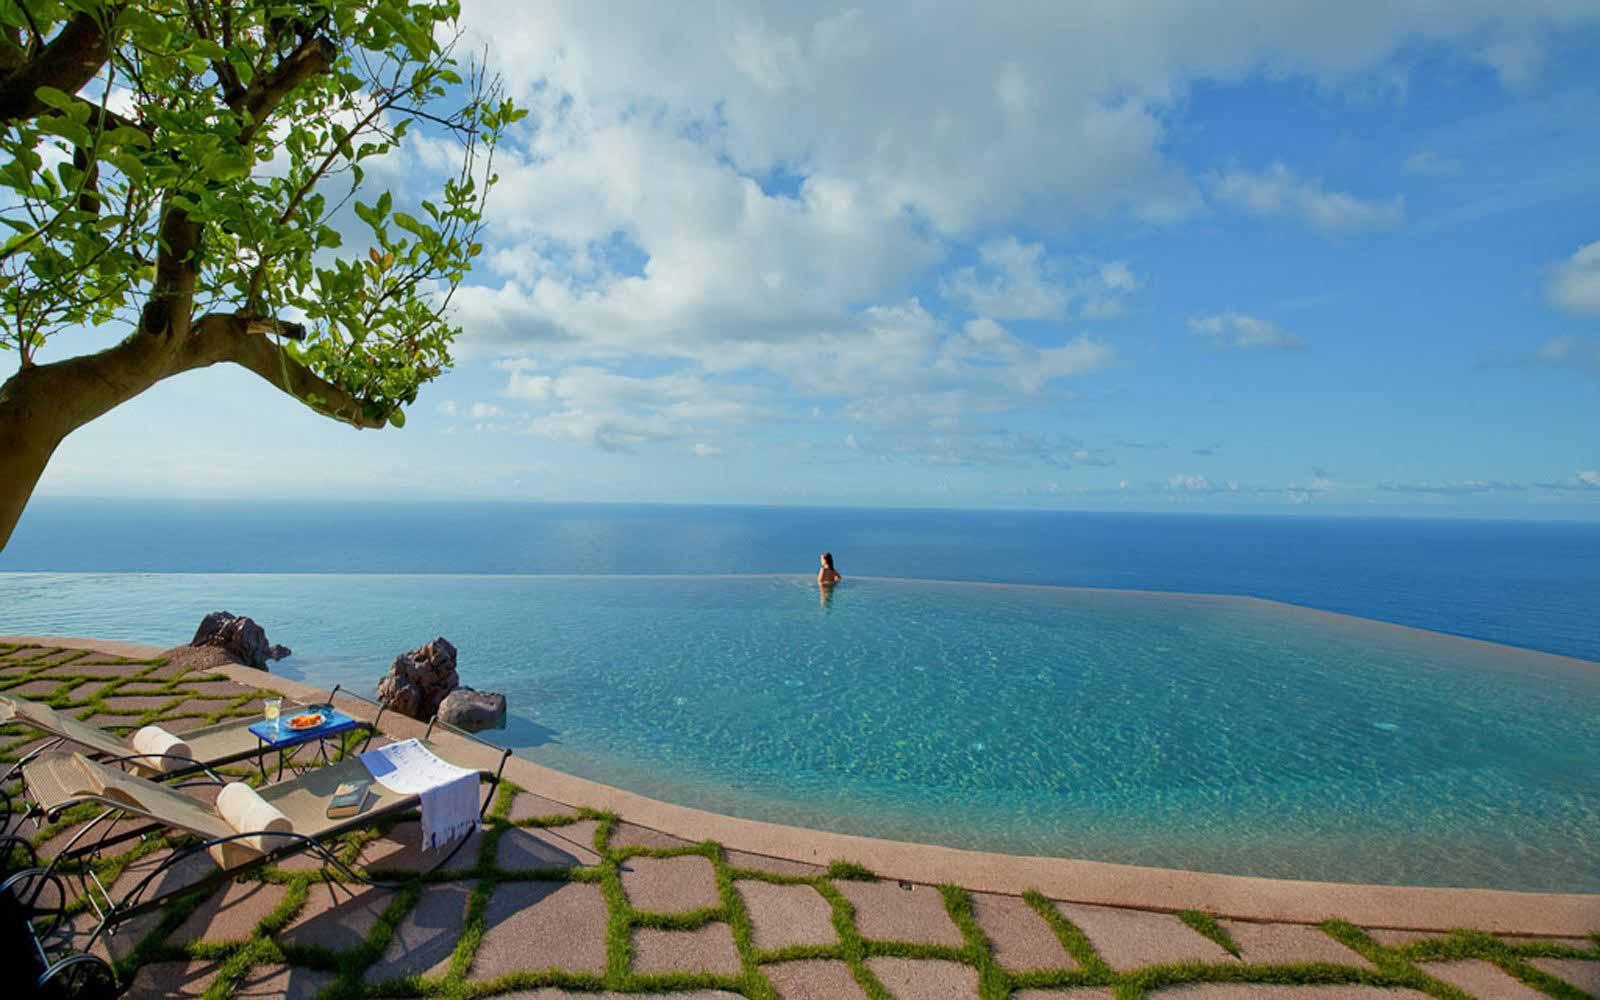 monastero santa rosa amalfi neapolitan riviera italy. Black Bedroom Furniture Sets. Home Design Ideas